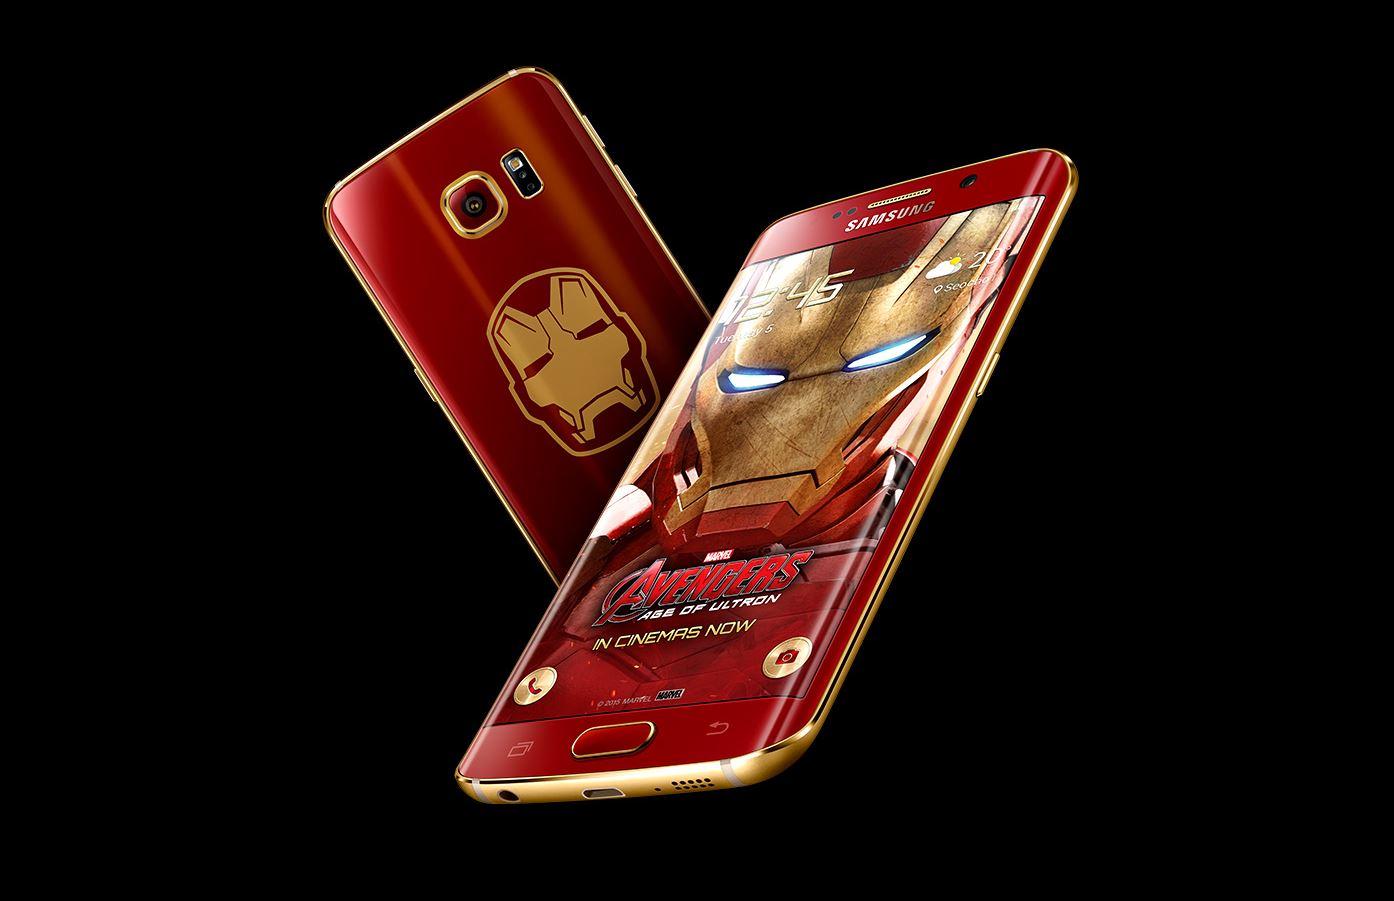 Photo of ثيم Iron Man لهاتف النوت 5 وجميع هواتف الأس 6